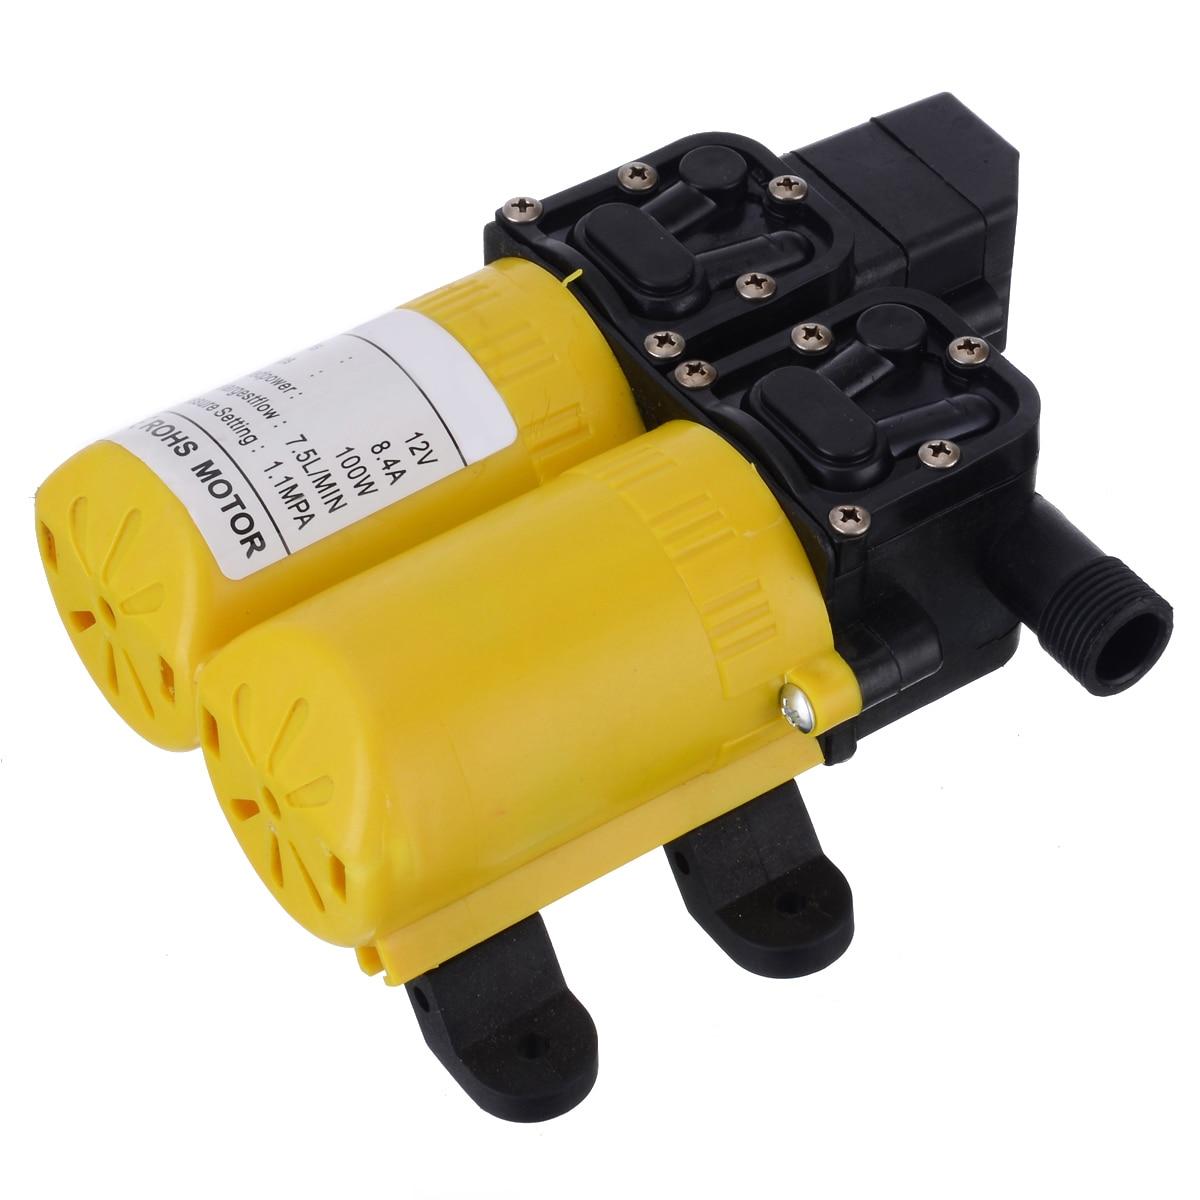 DC 12V 100W Auto Self Priming Water Pump High Pressure Diaphragm Small Safe Pump Boat Caravan Marine Motor